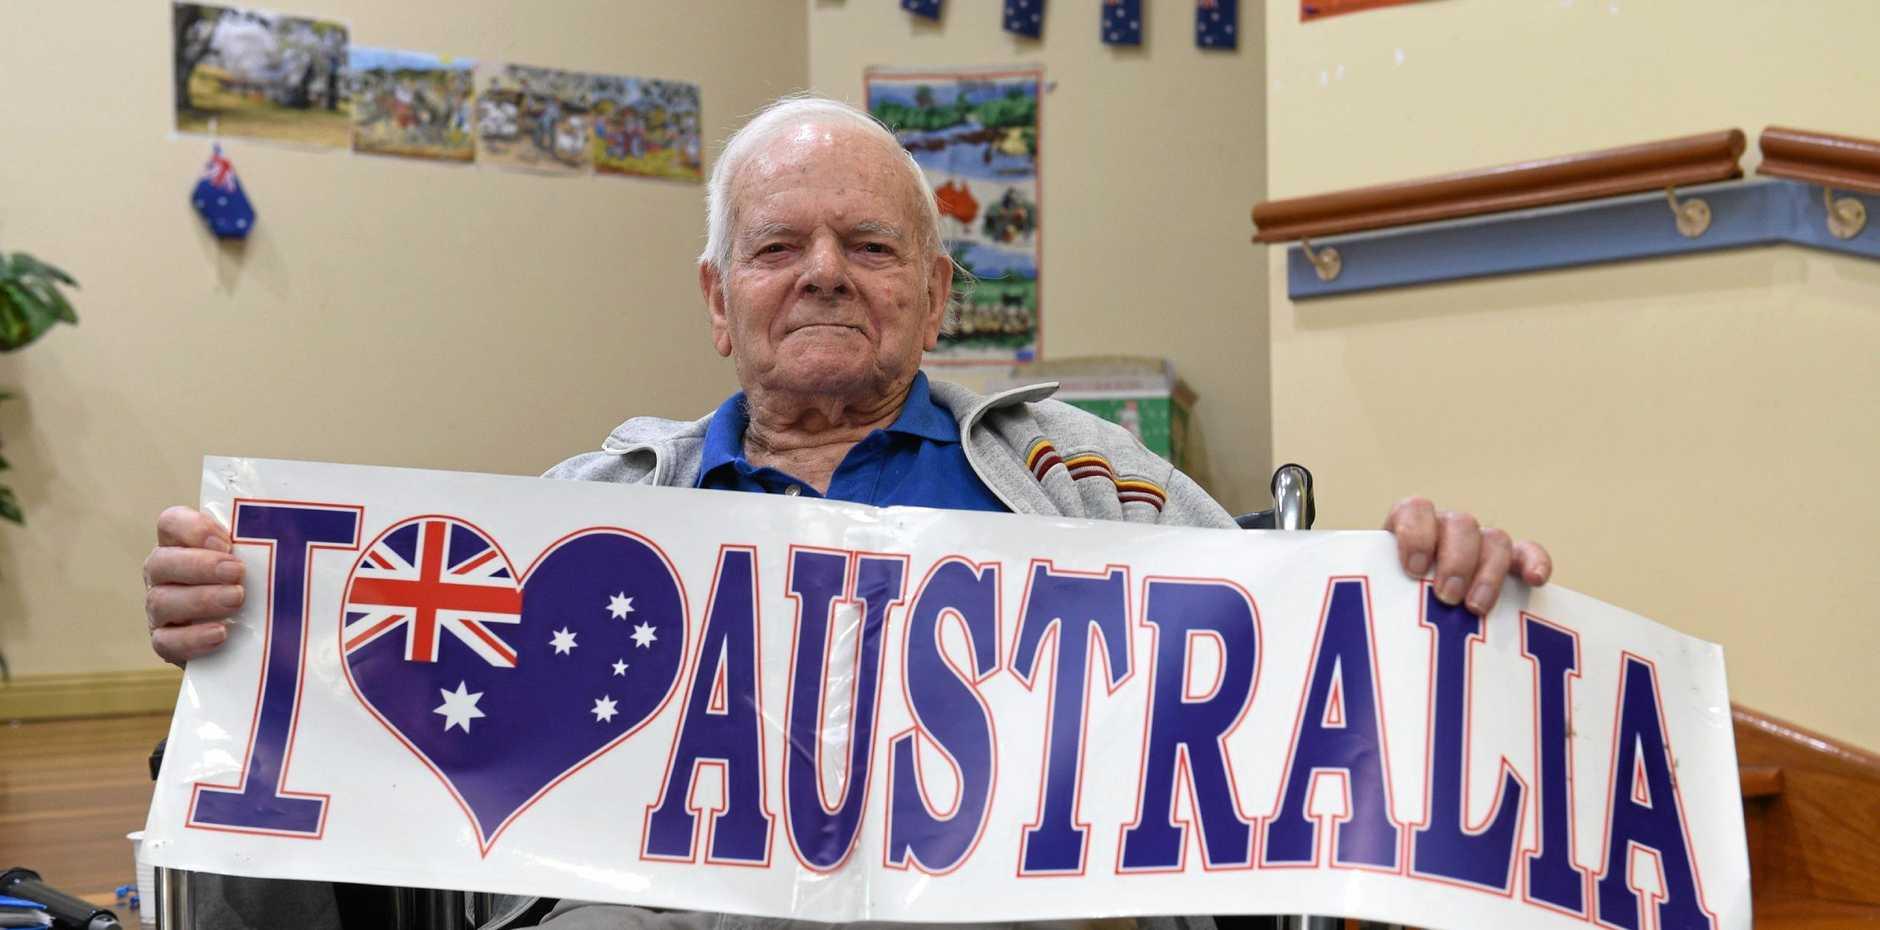 Bob Larter shows off his patriotism.